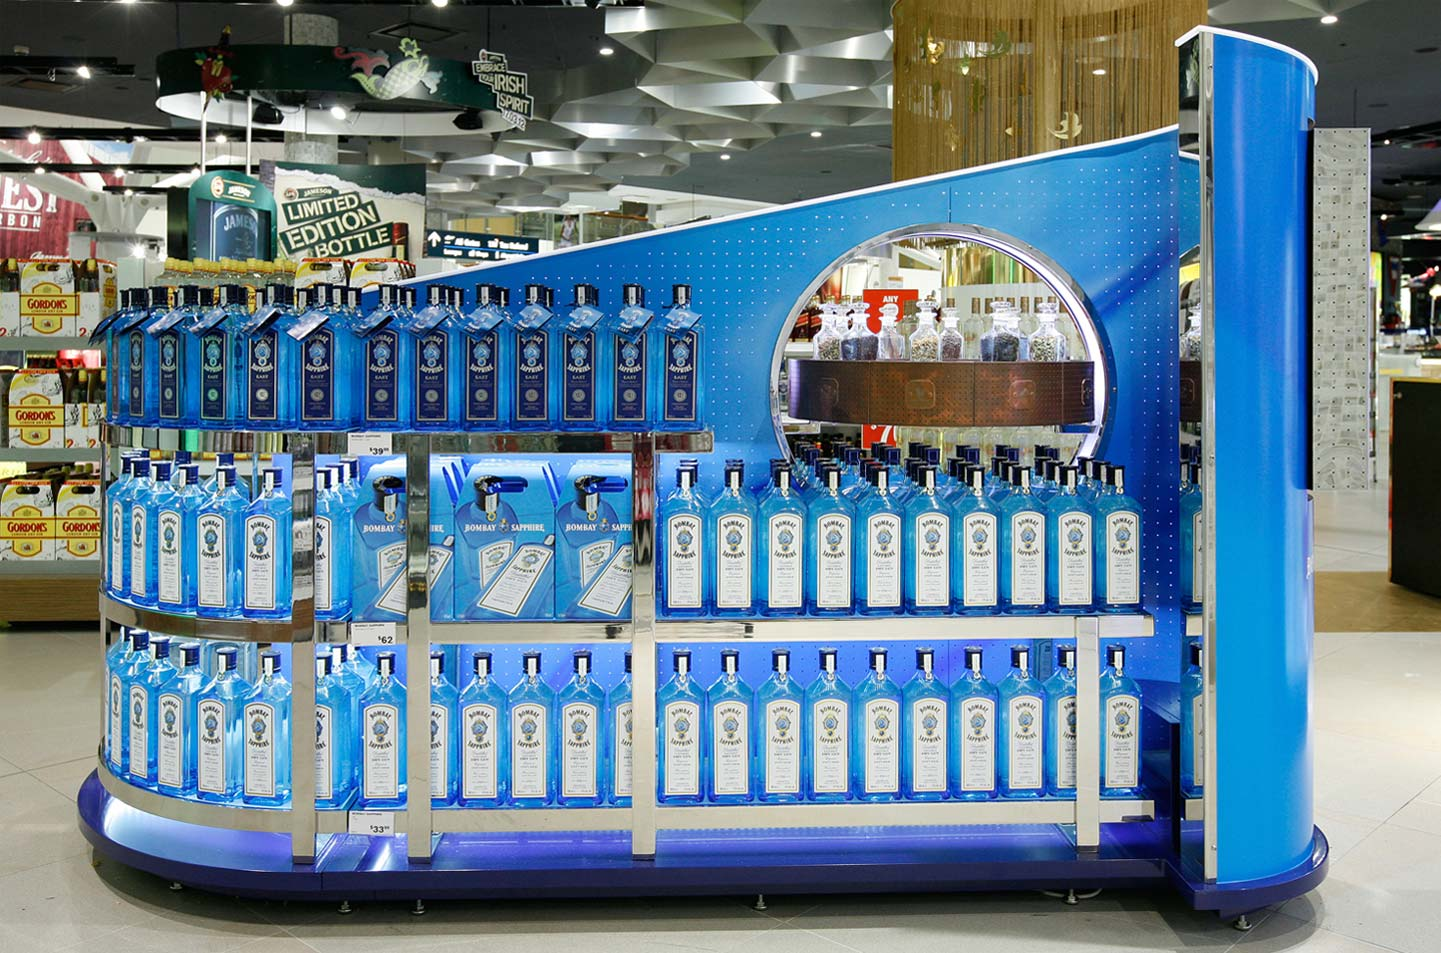 Innovative Bombay Sapphire visual merchandising display Sydney Airport designed by CampbellRigg